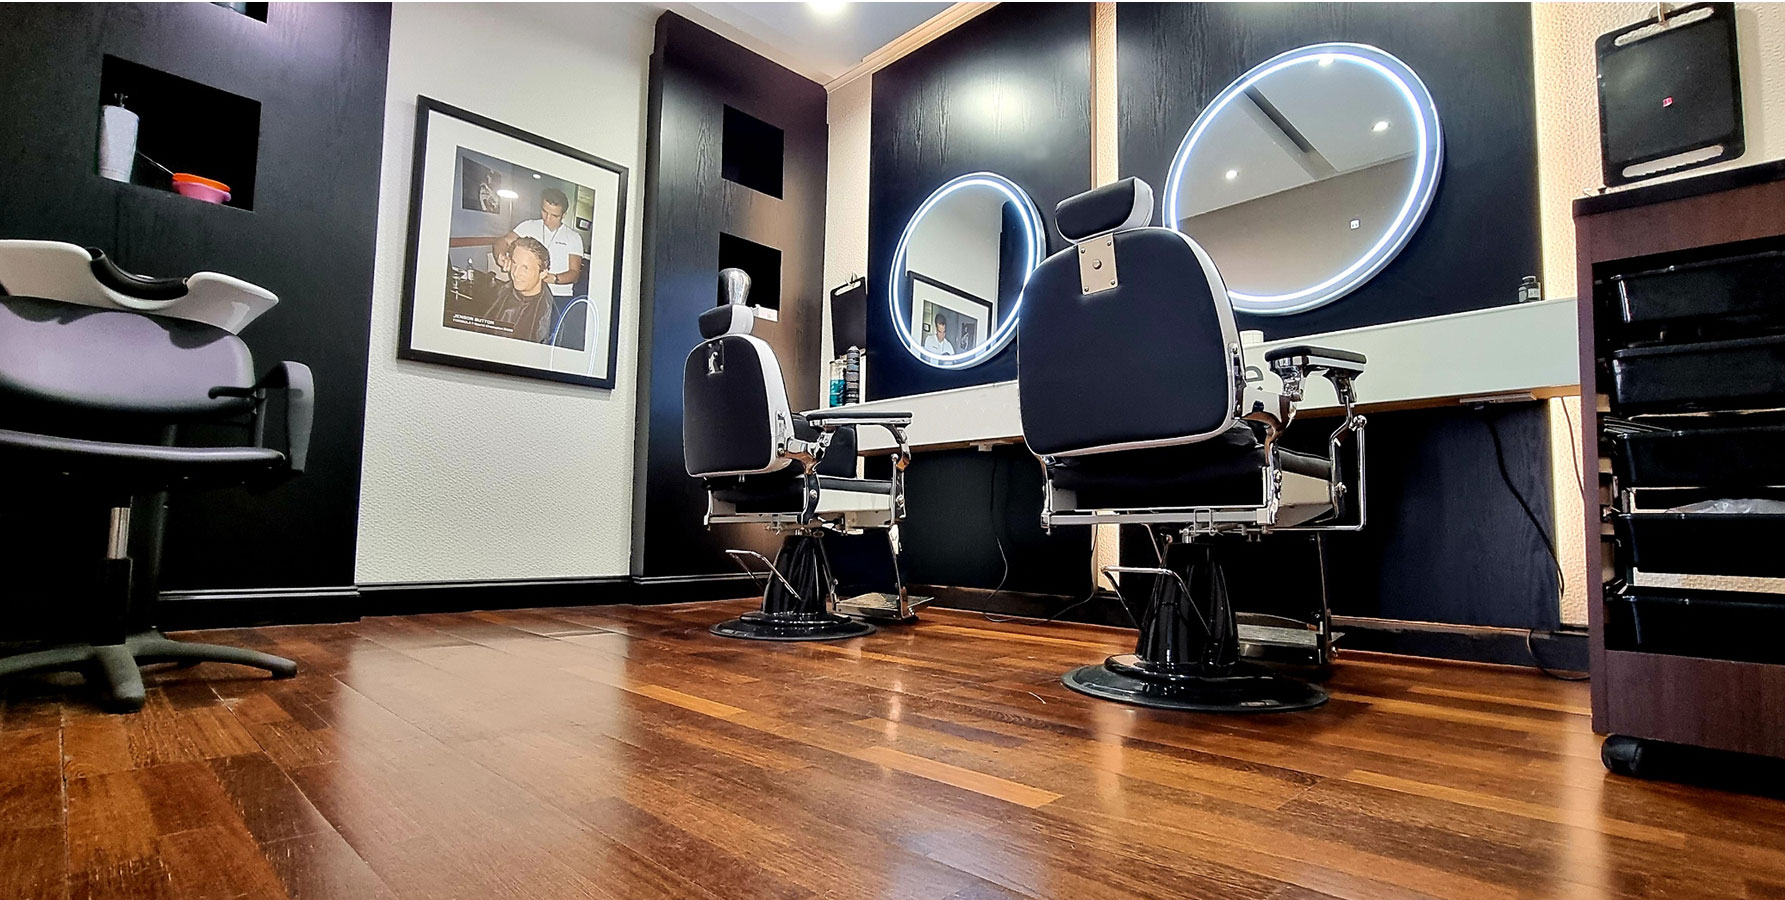 Jason Shankey Barber And Hairdressing Training Academy | 235 Lisburn Road, Belfast BT9 7EN | +44 20 7148 3877